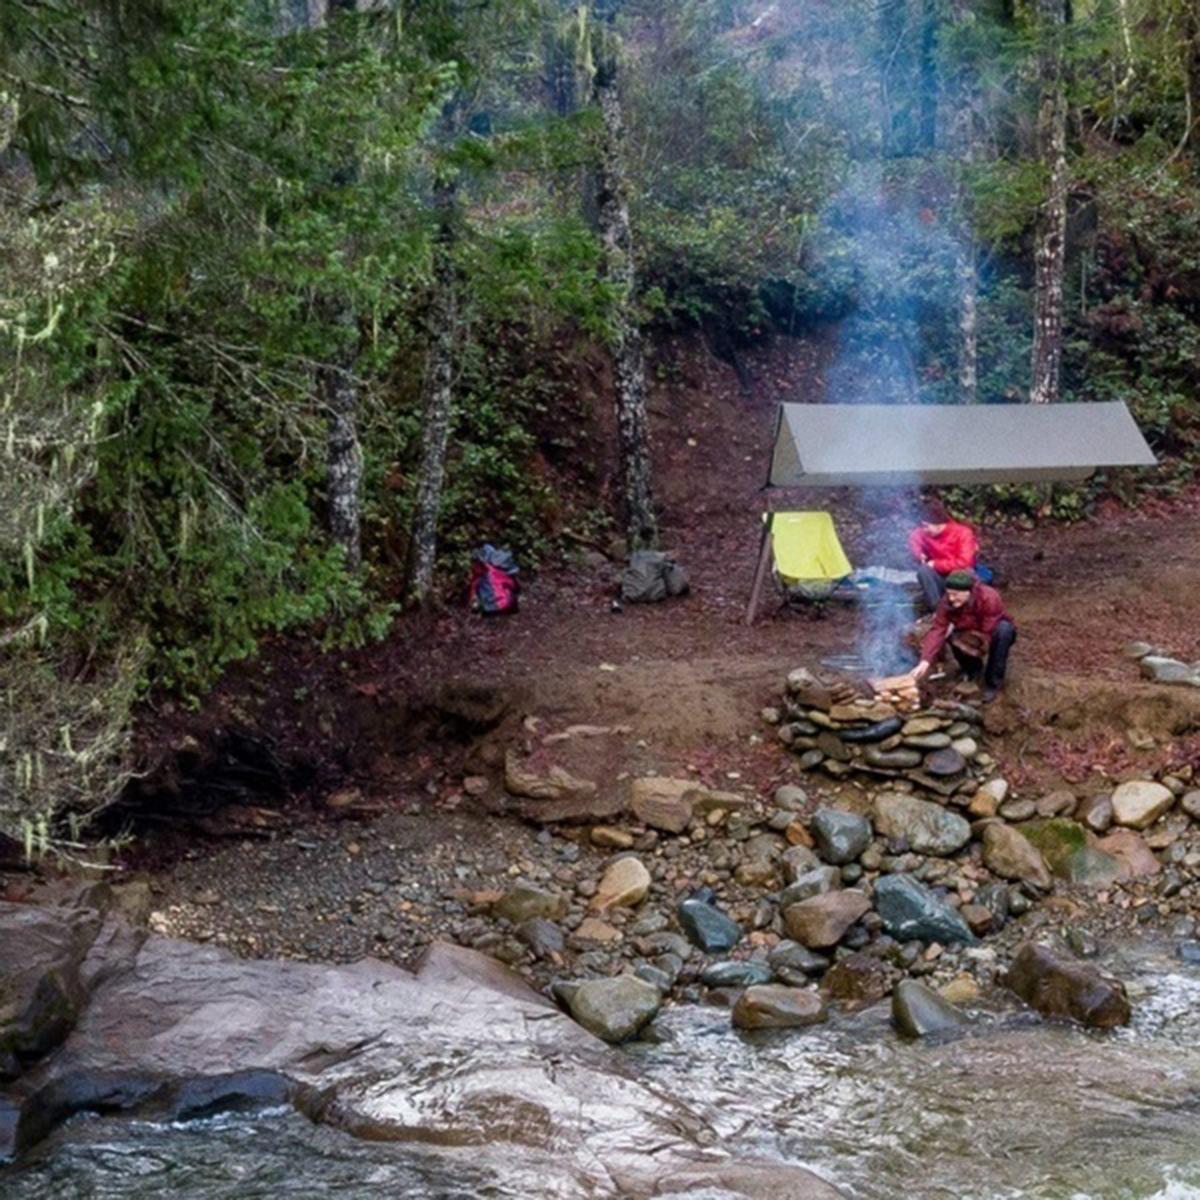 Outdoor Tent Sunshade Portable Hammock Rain Fly Waterproof Tent Tarp Camping Backpacking Tarp